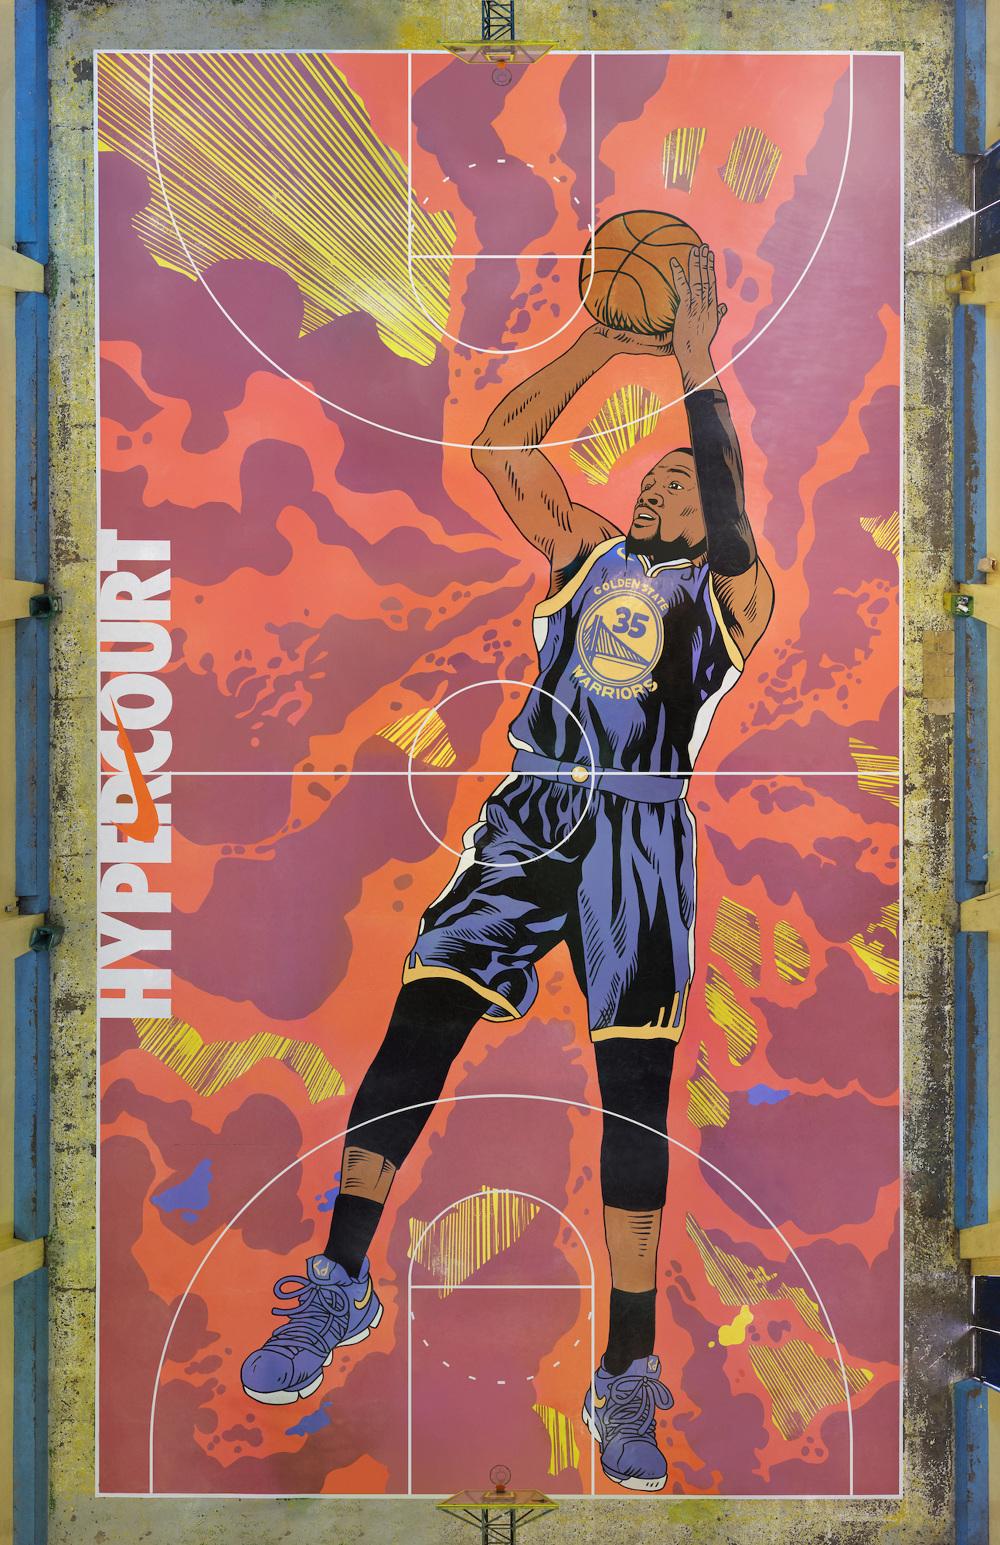 Nike-Basketball-Court3-101117Layers-copy-2_1000.jpg